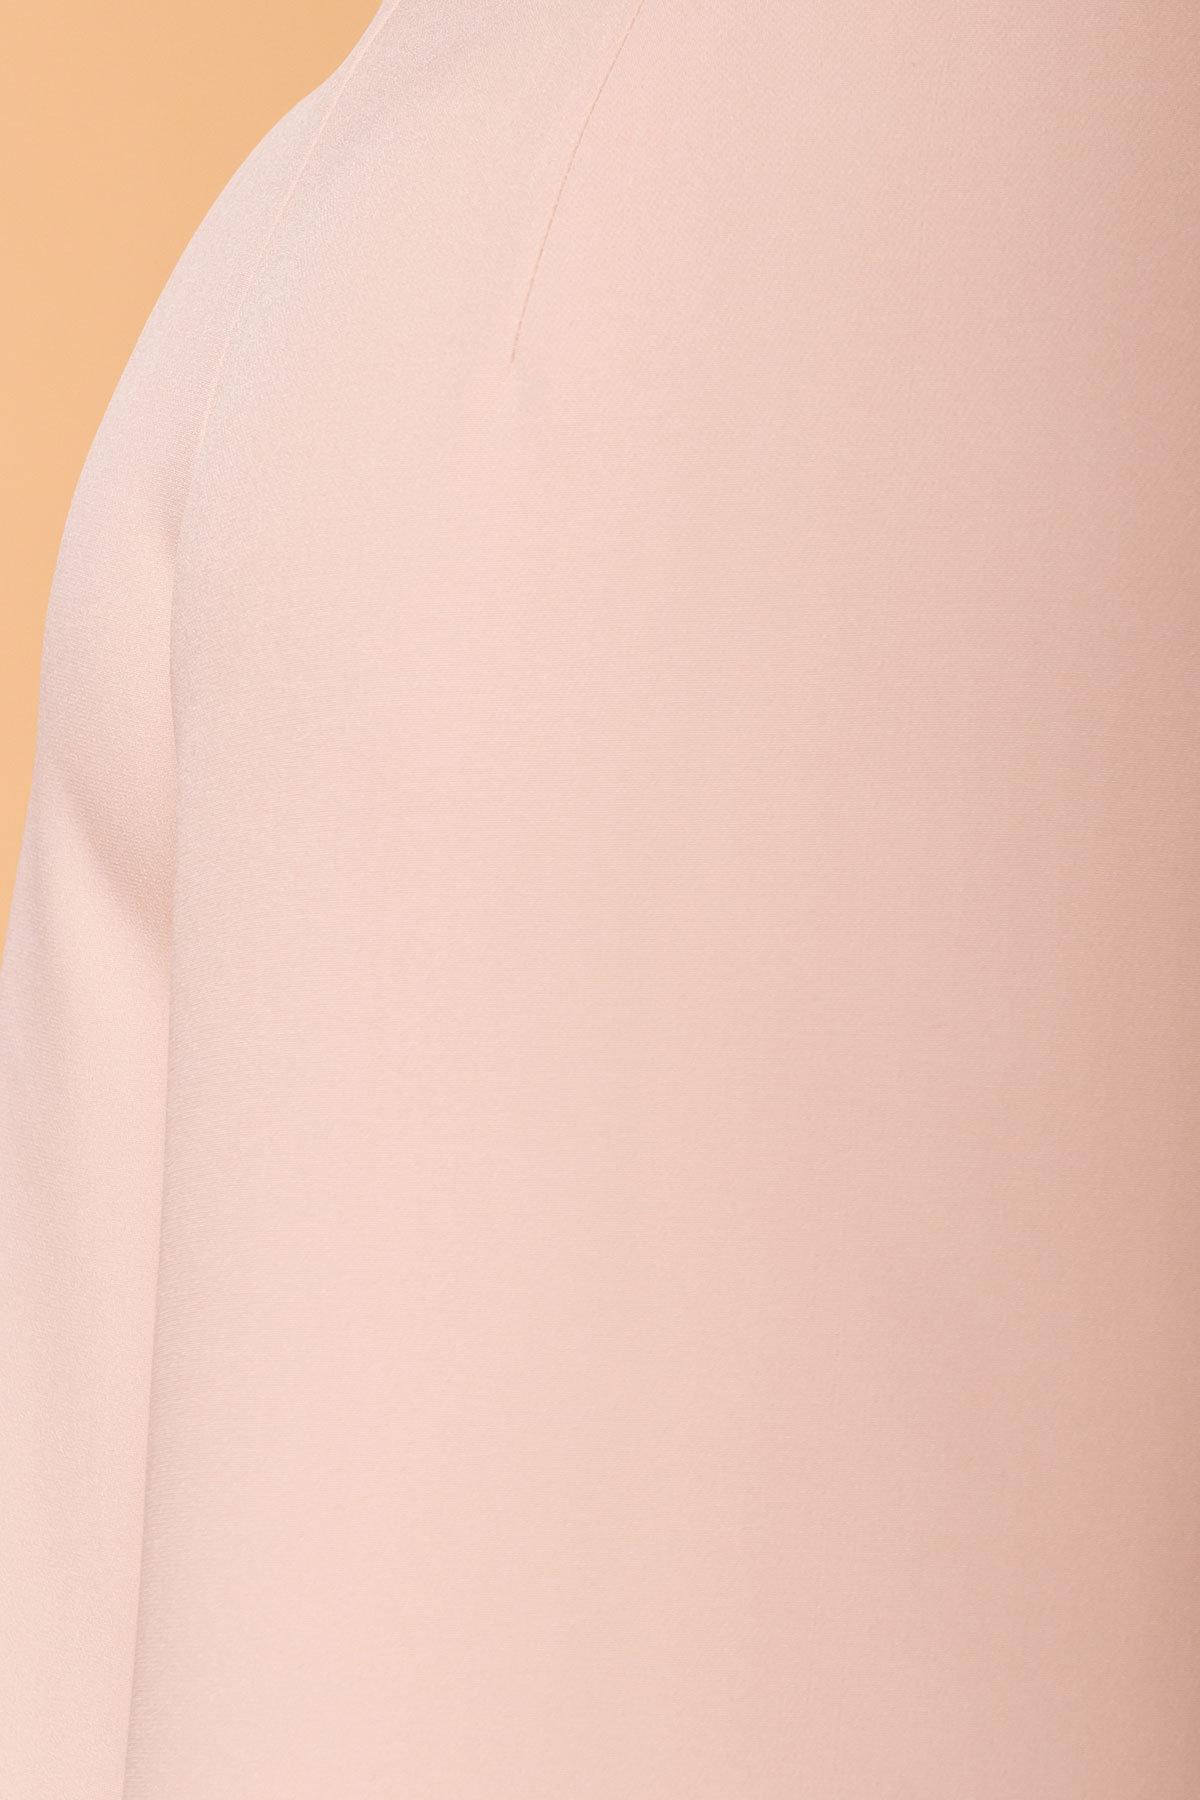 Брюки кюлоты Шерон 2800 АРТ. 41362 Цвет: Бежевый - фото 7, интернет магазин tm-modus.ru